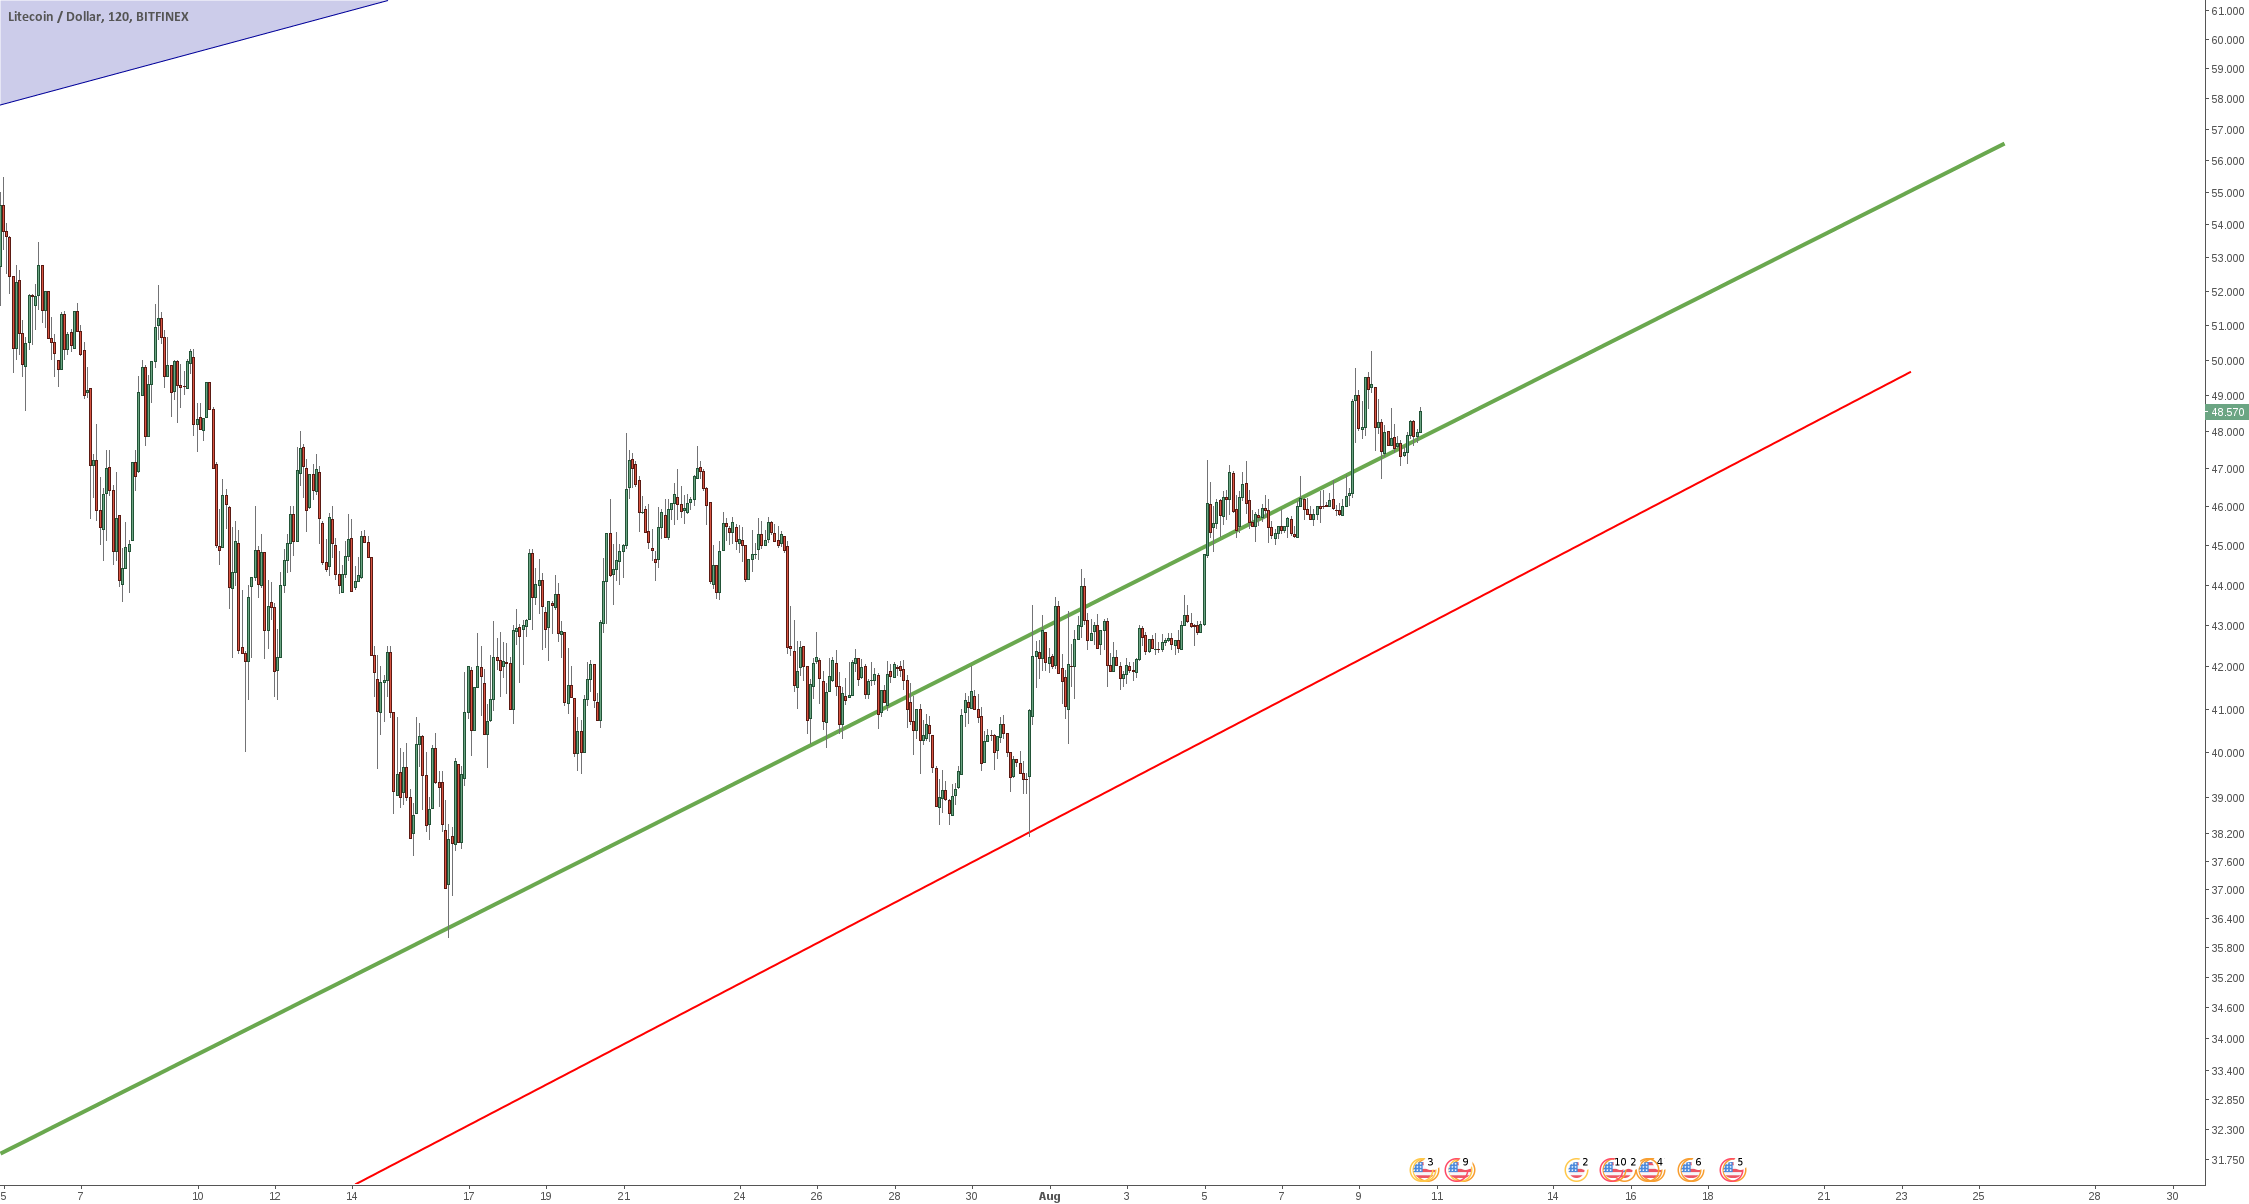 Litecoin - well over green line